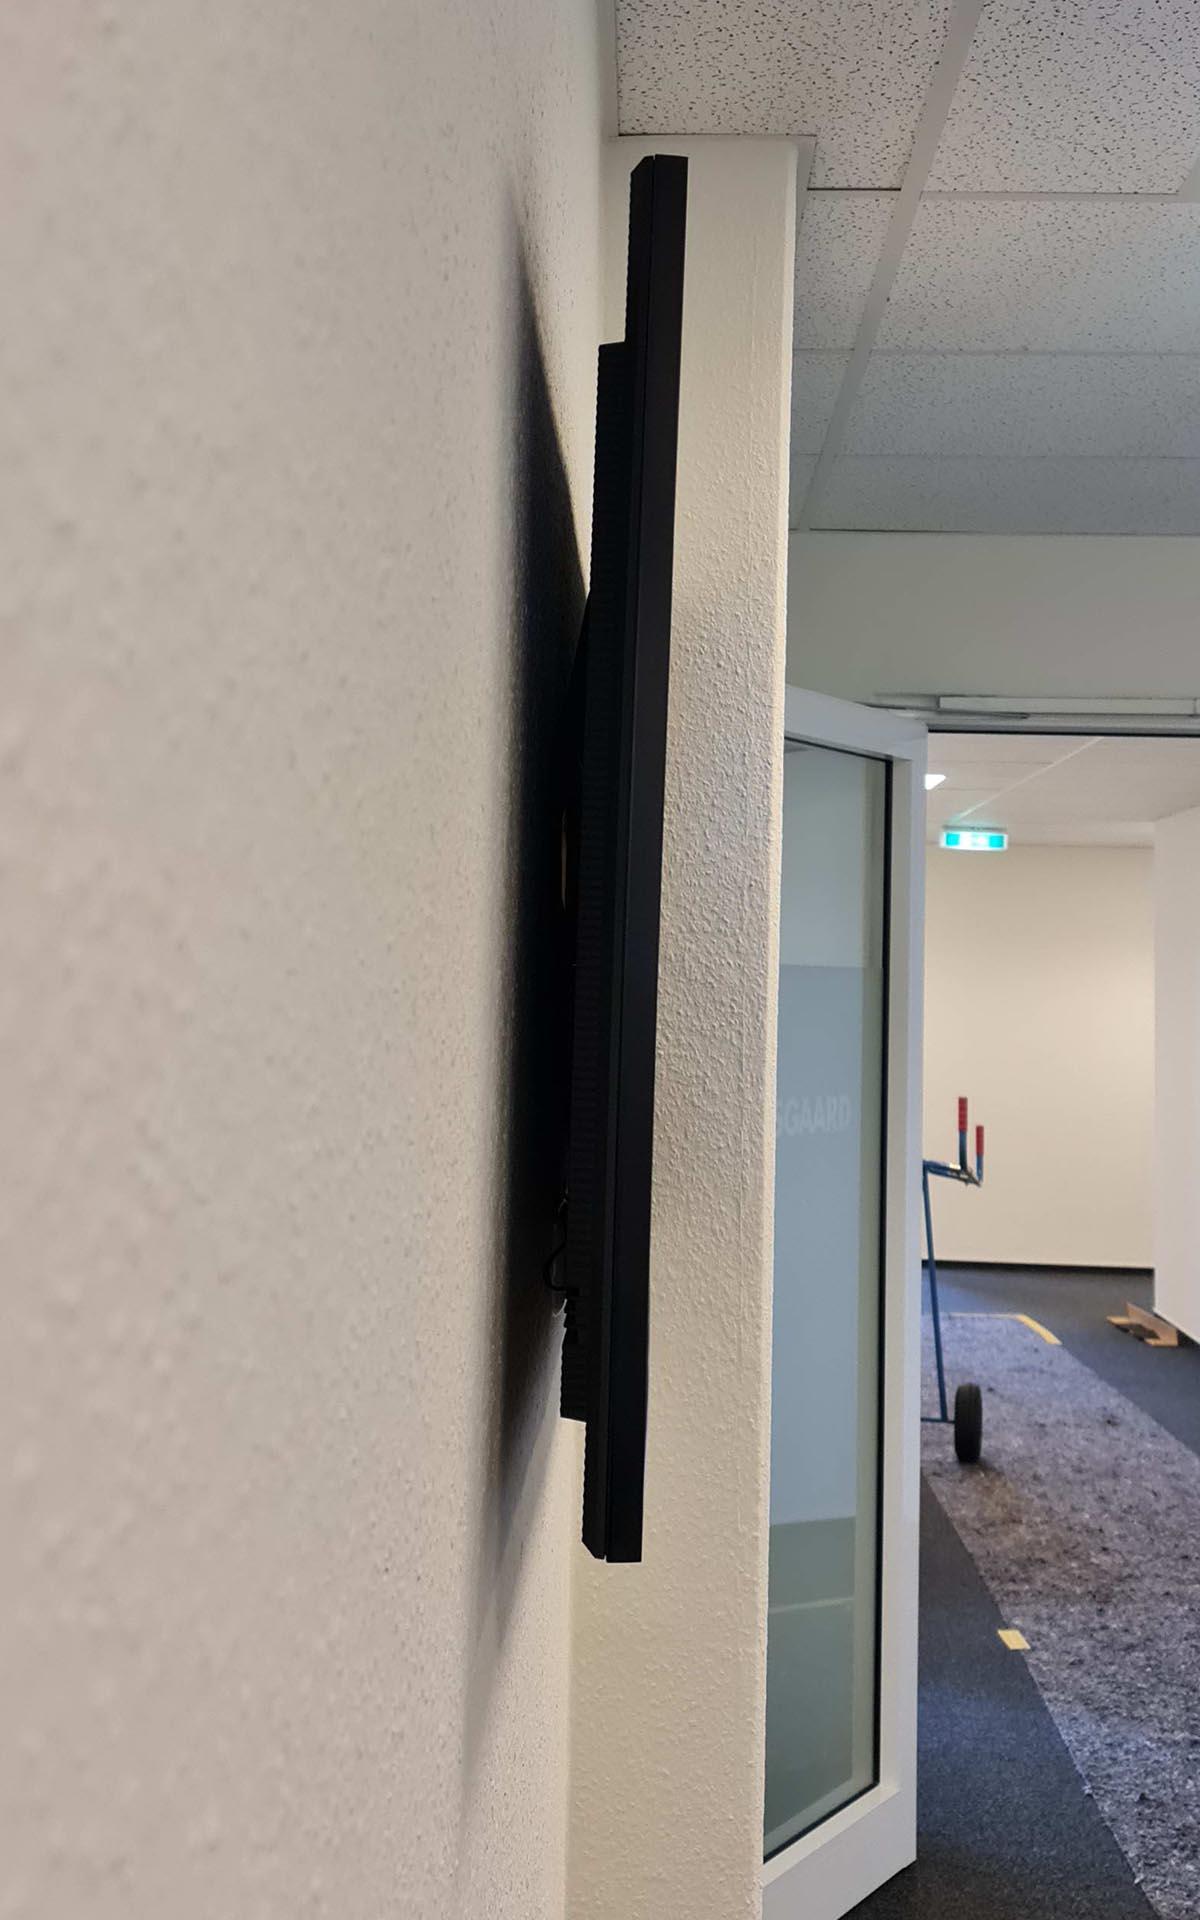 Digital Signage am Büroeingang, innen